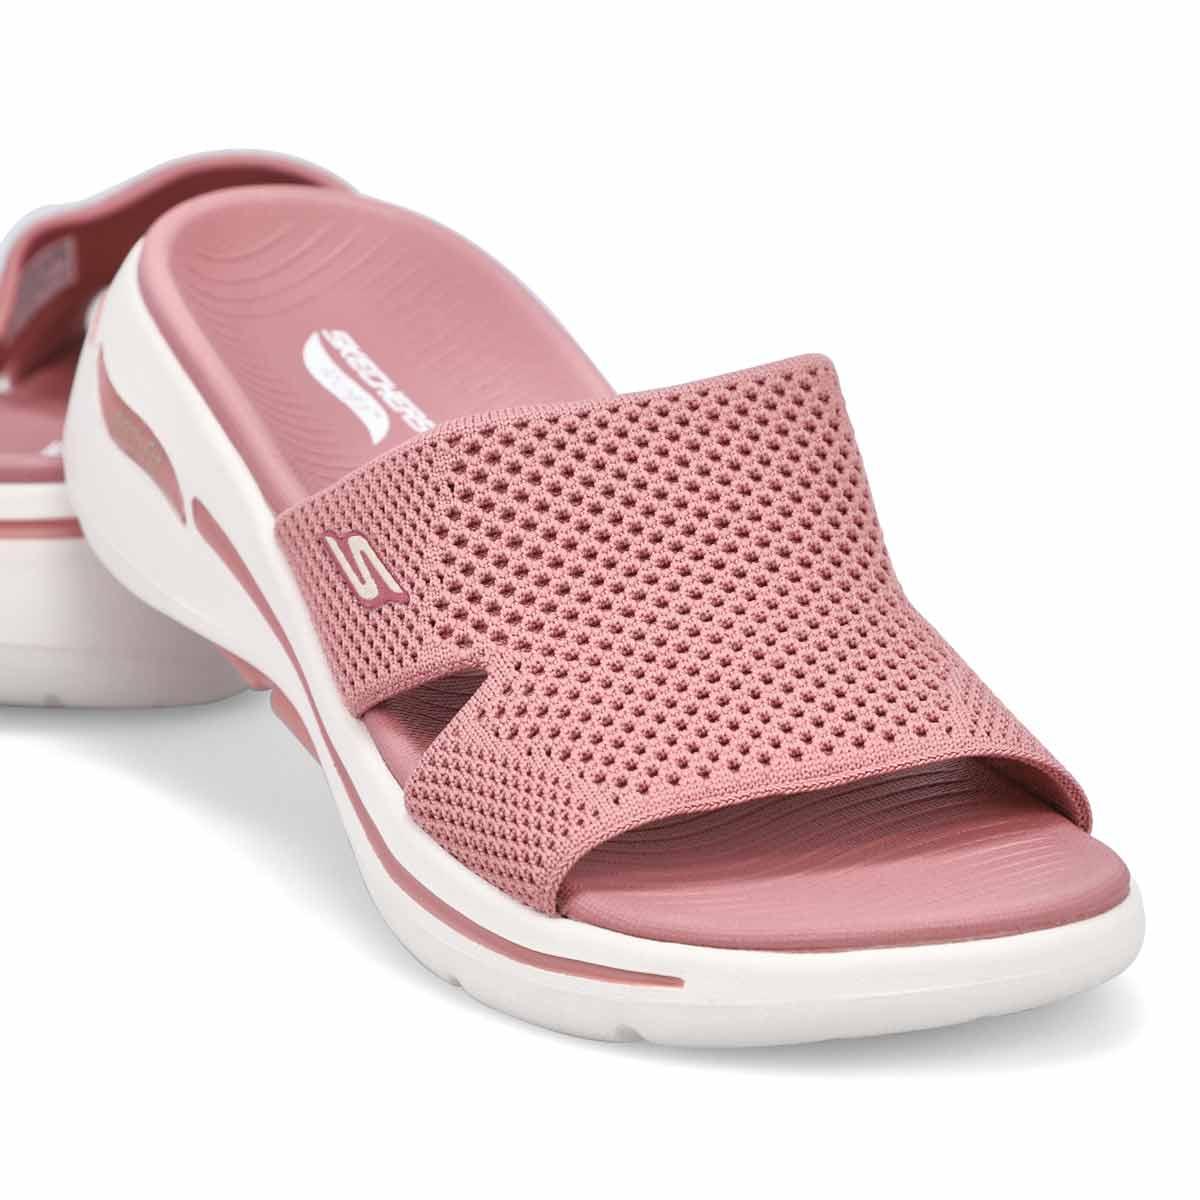 Women's Go Walk Arch Fit Sandal - Rose